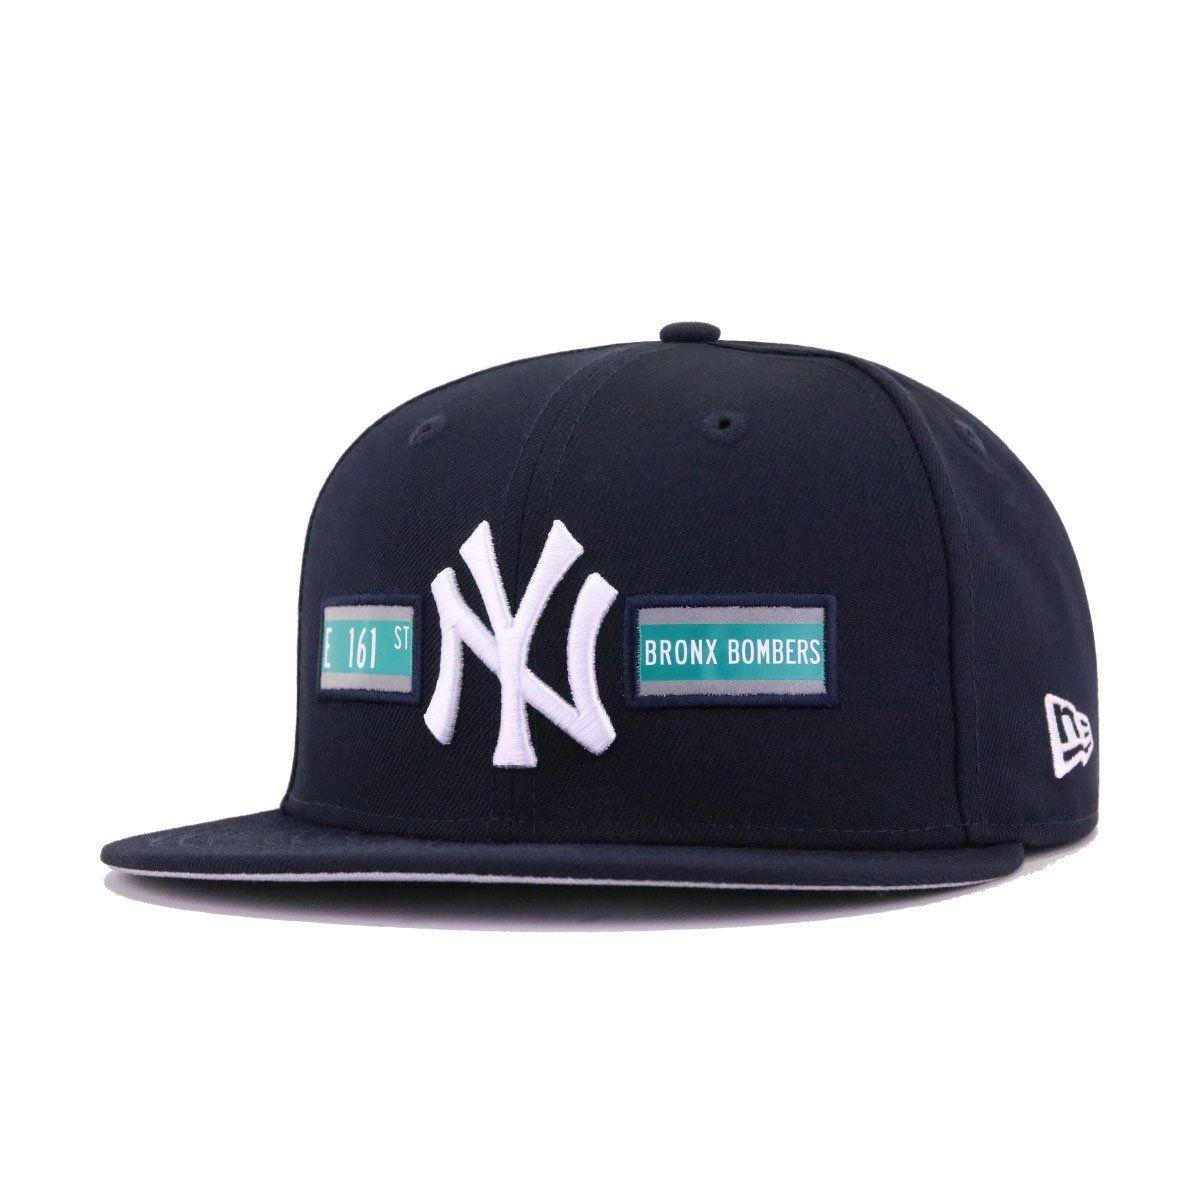 New York Yankees Navy Reflective New Era 9fifty Snapback In 2020 New York Yankees Yankees Snapback